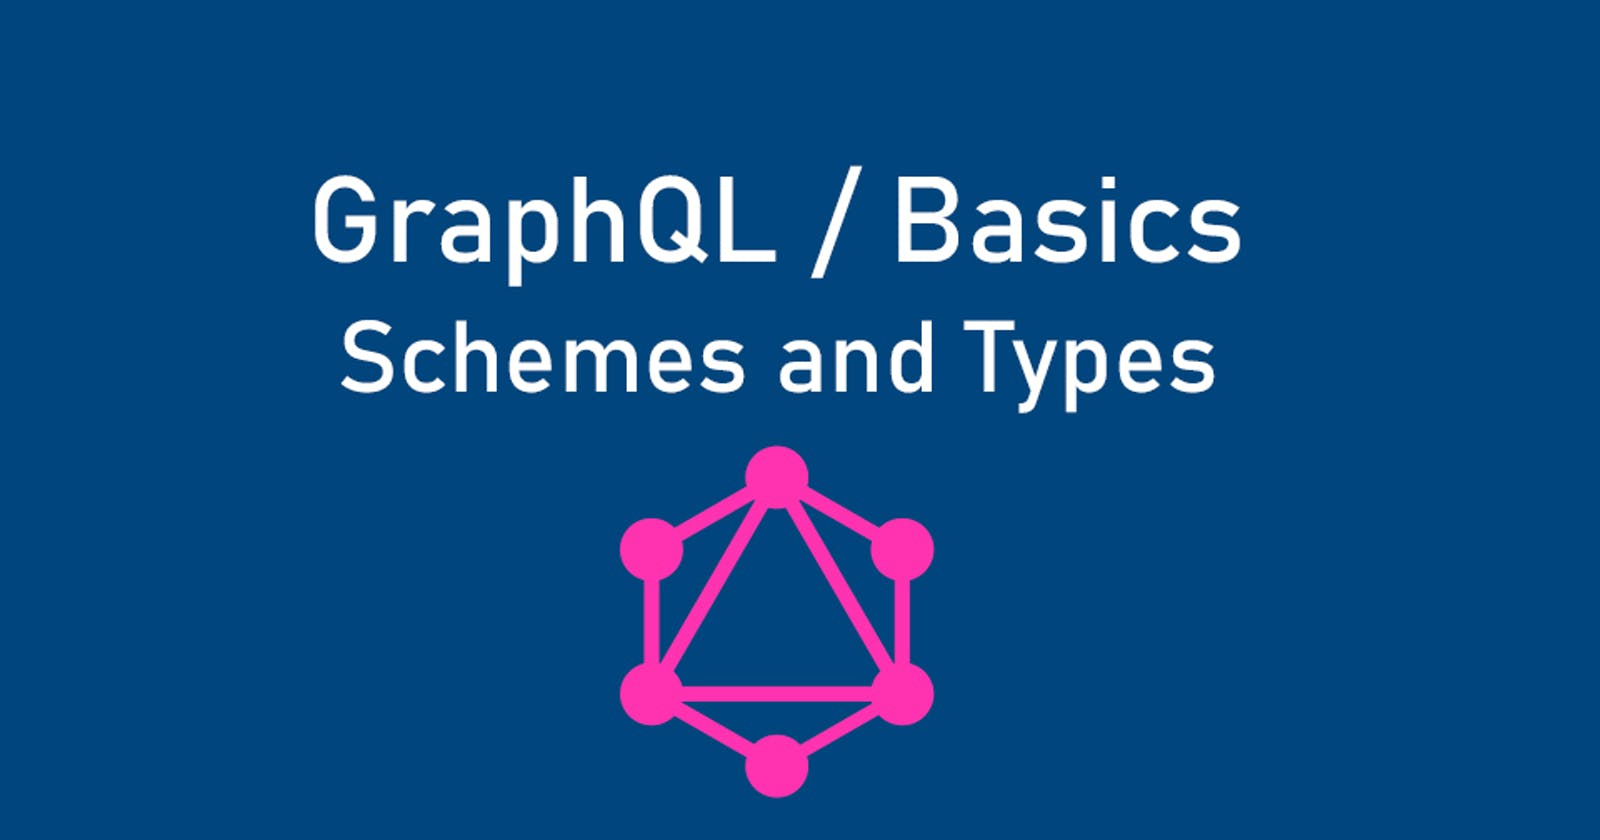 GraphQL basics. Part 2. Schemes and types